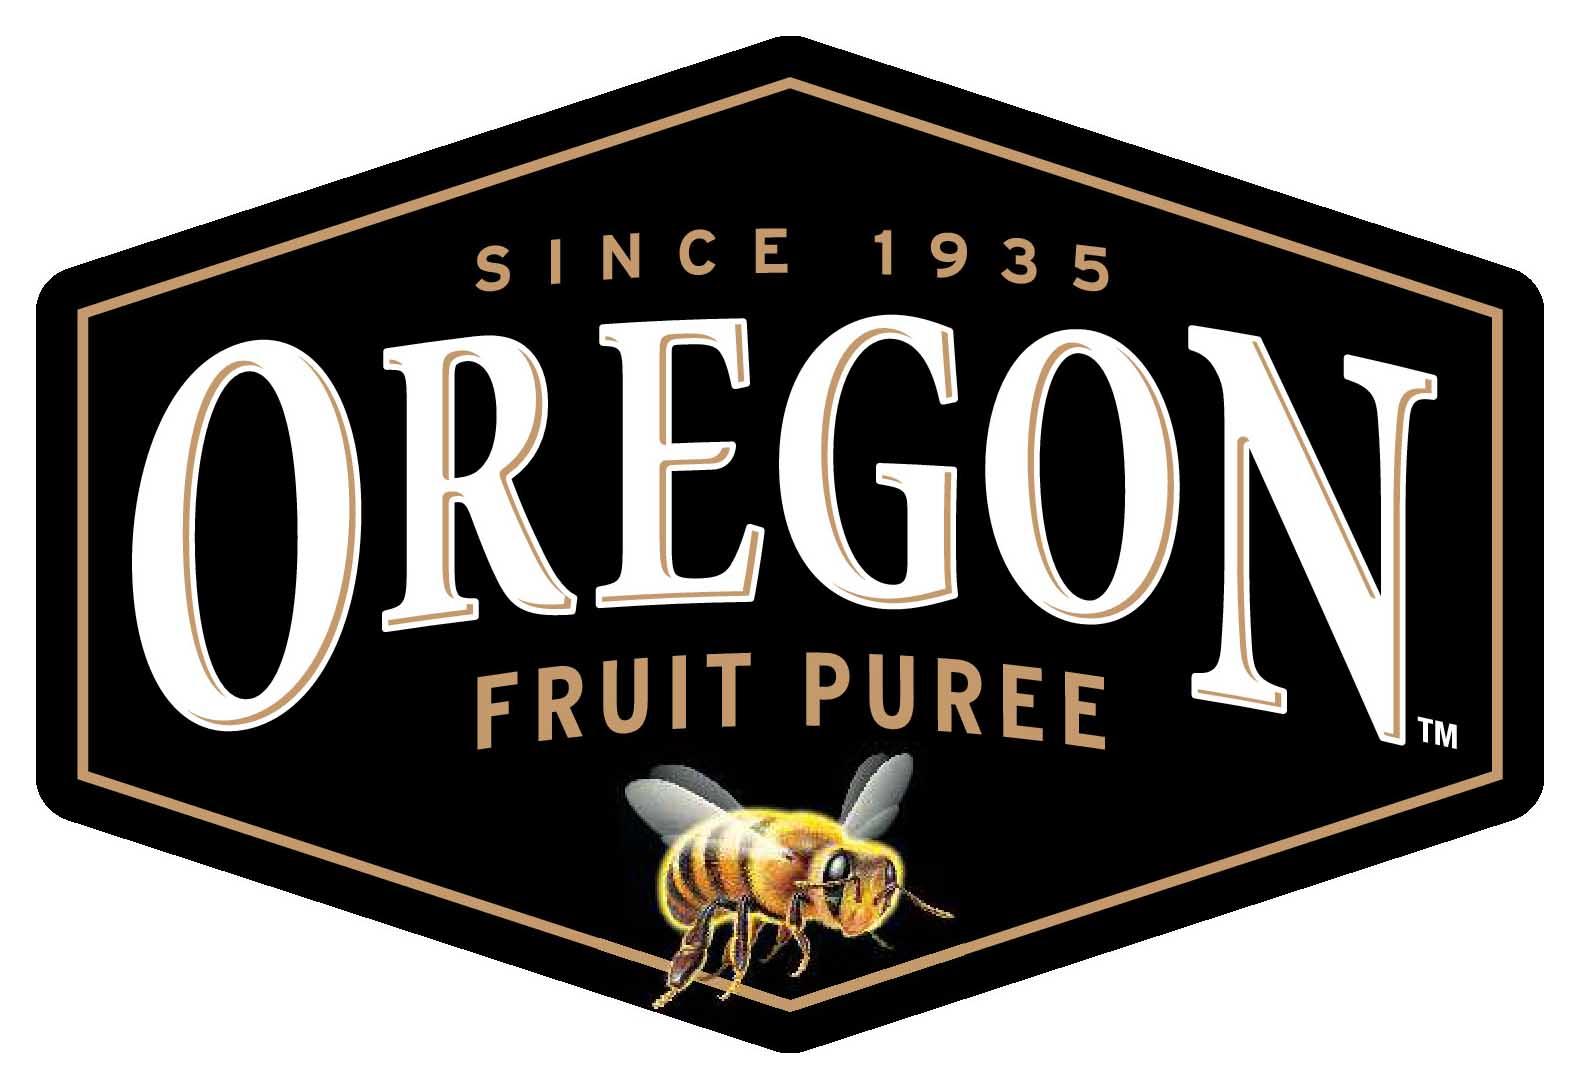 Oregon Fruit Puree logo